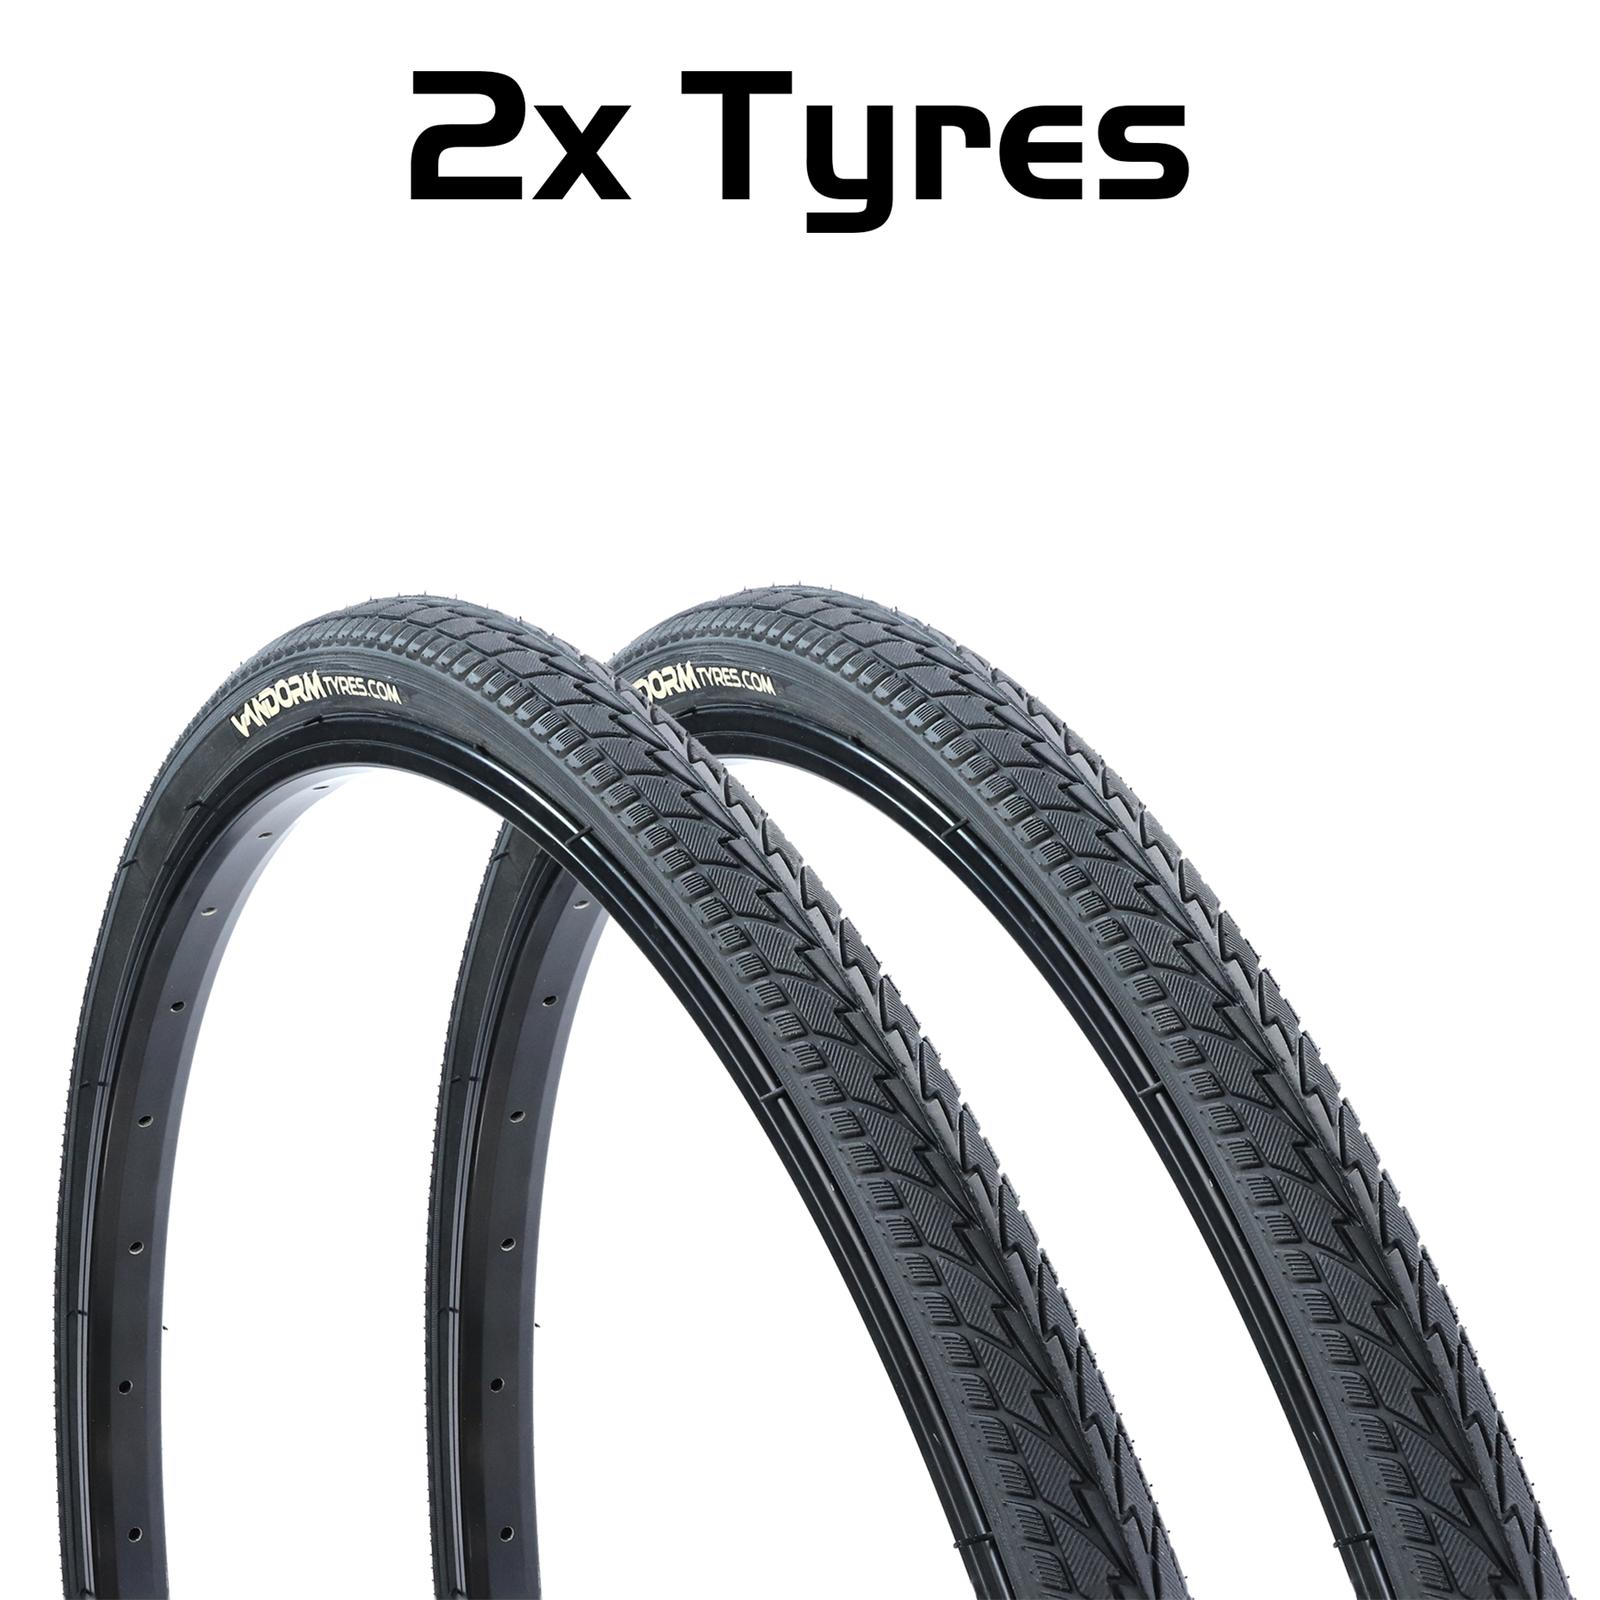 40-622 Pair Of 700x38C Road Tyres E-507-05